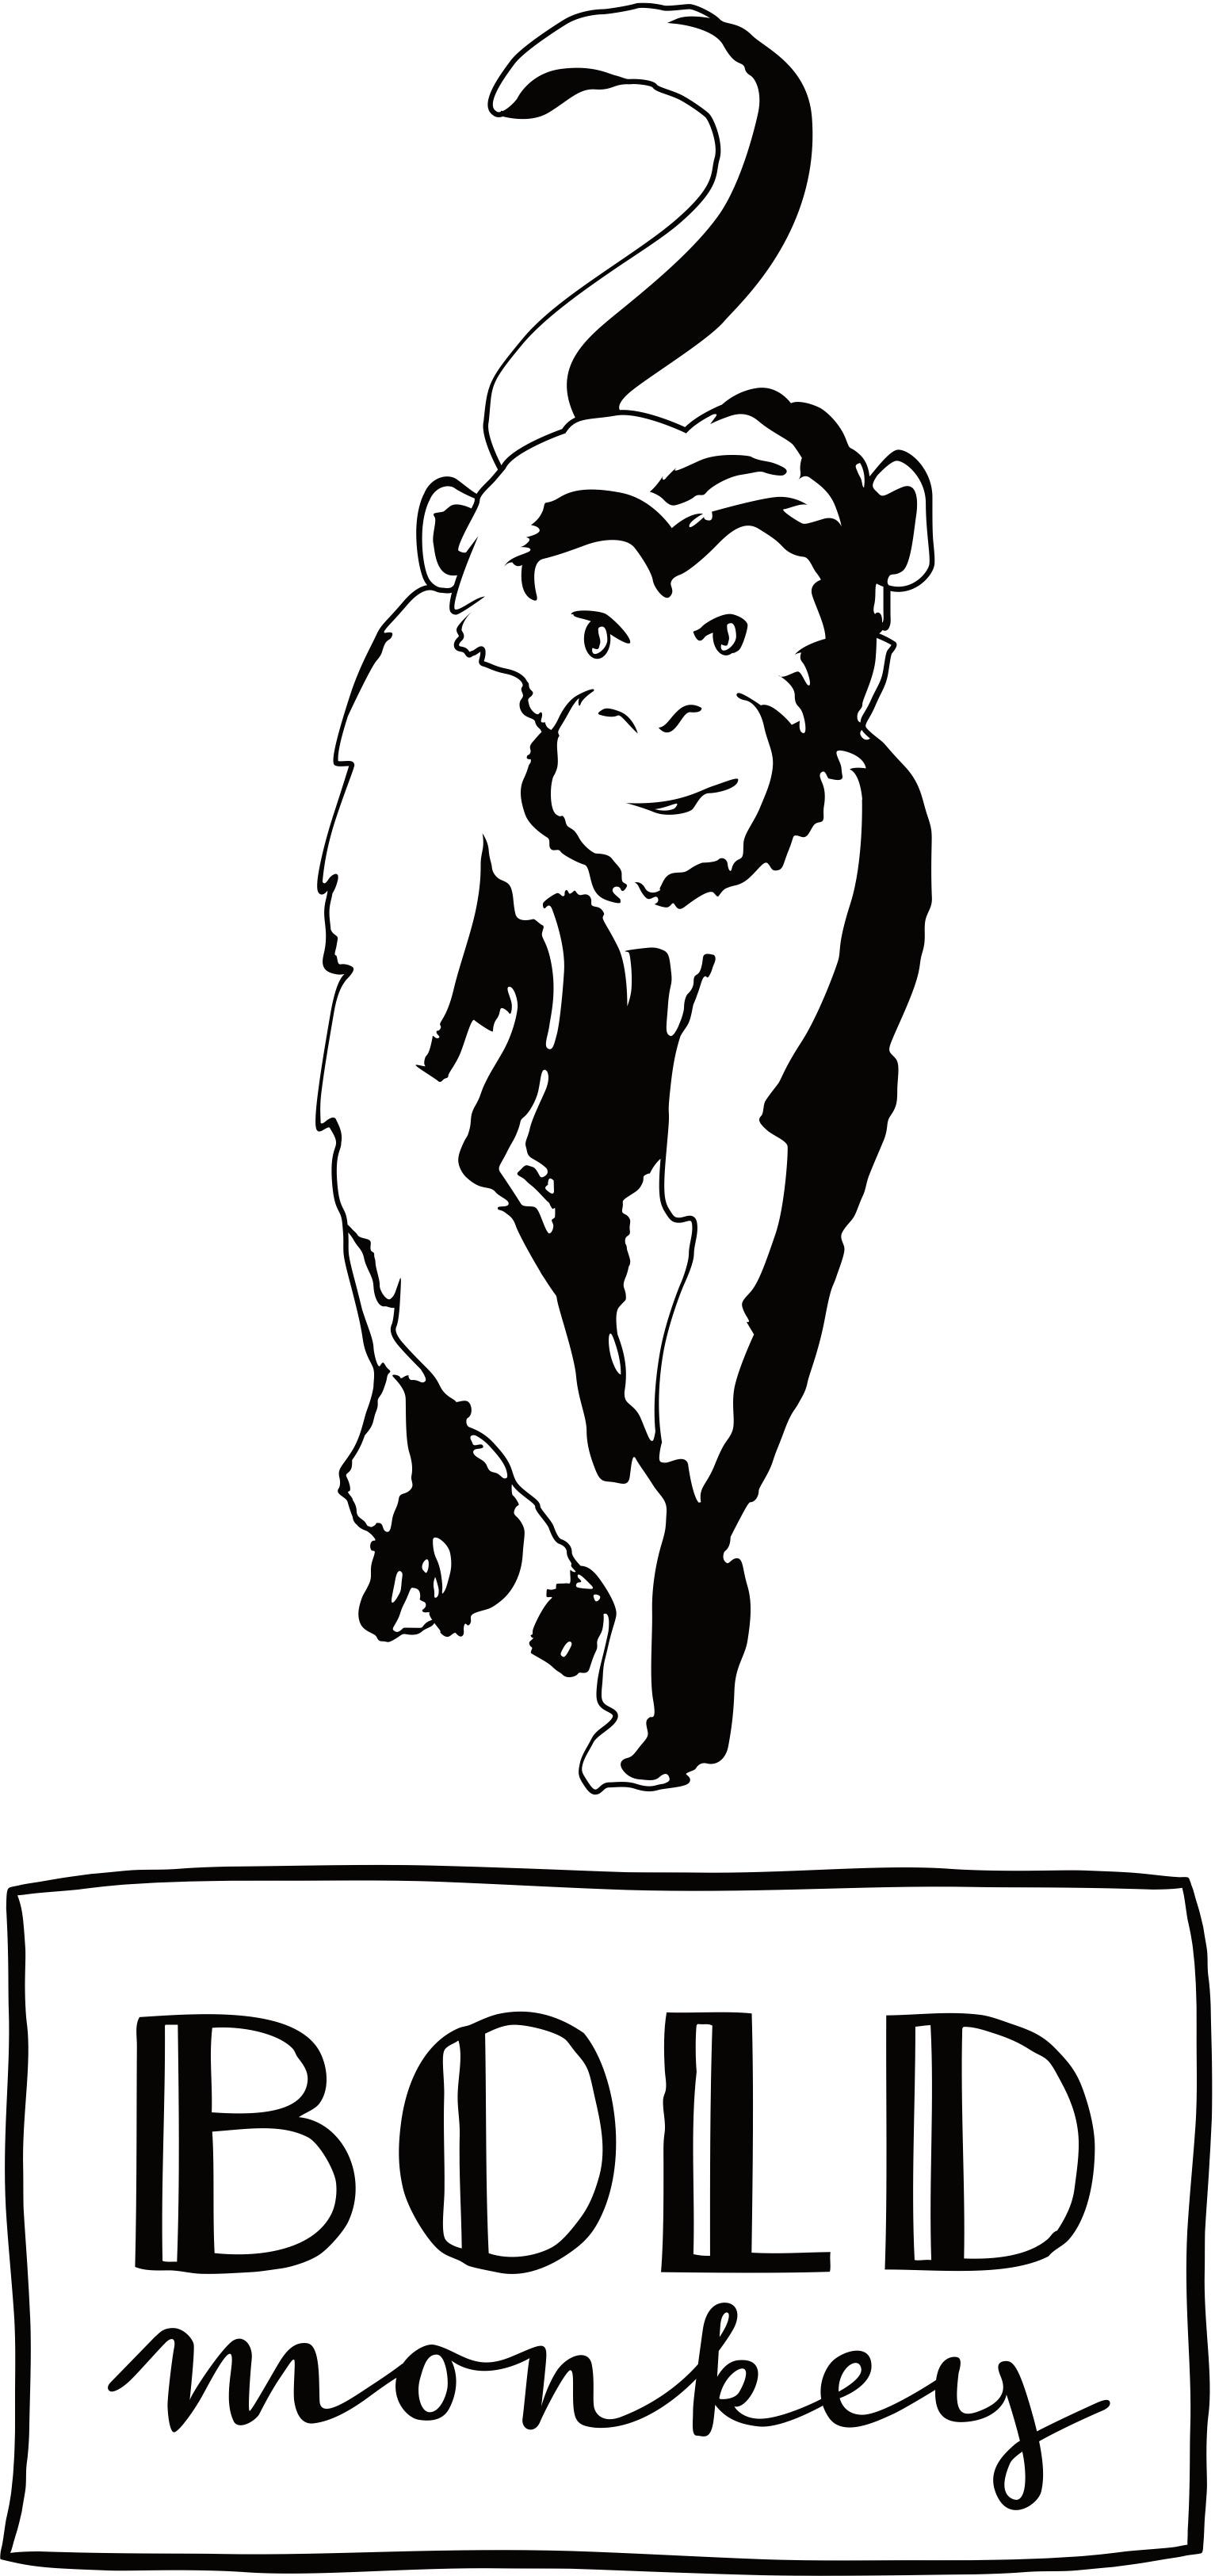 Bold Monkey i am not a macaron barkruk velvet blauw gouden poten vooraanzicht